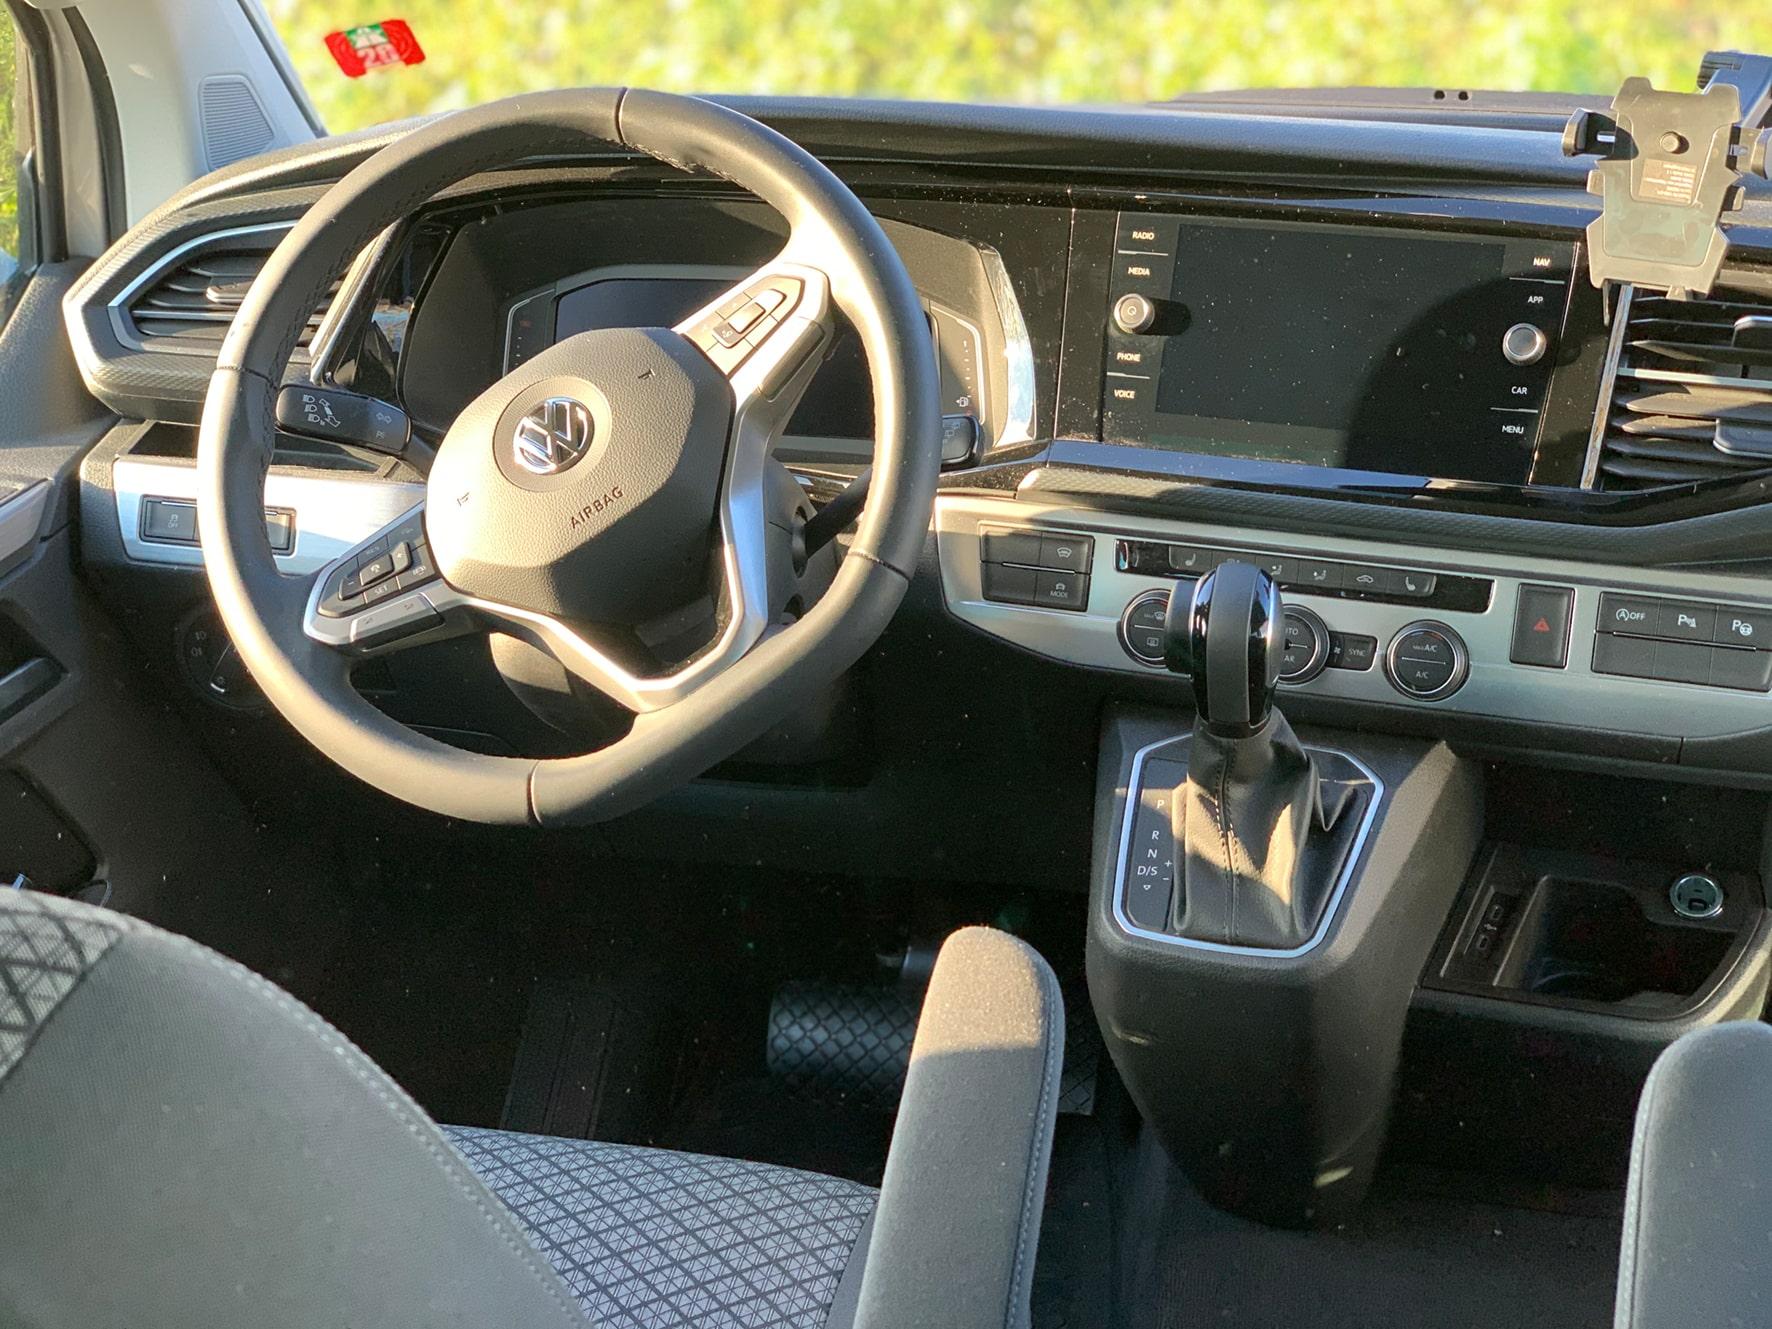 Hirschbulli Hirschbühl Caravan Rental Fahrerraum 2